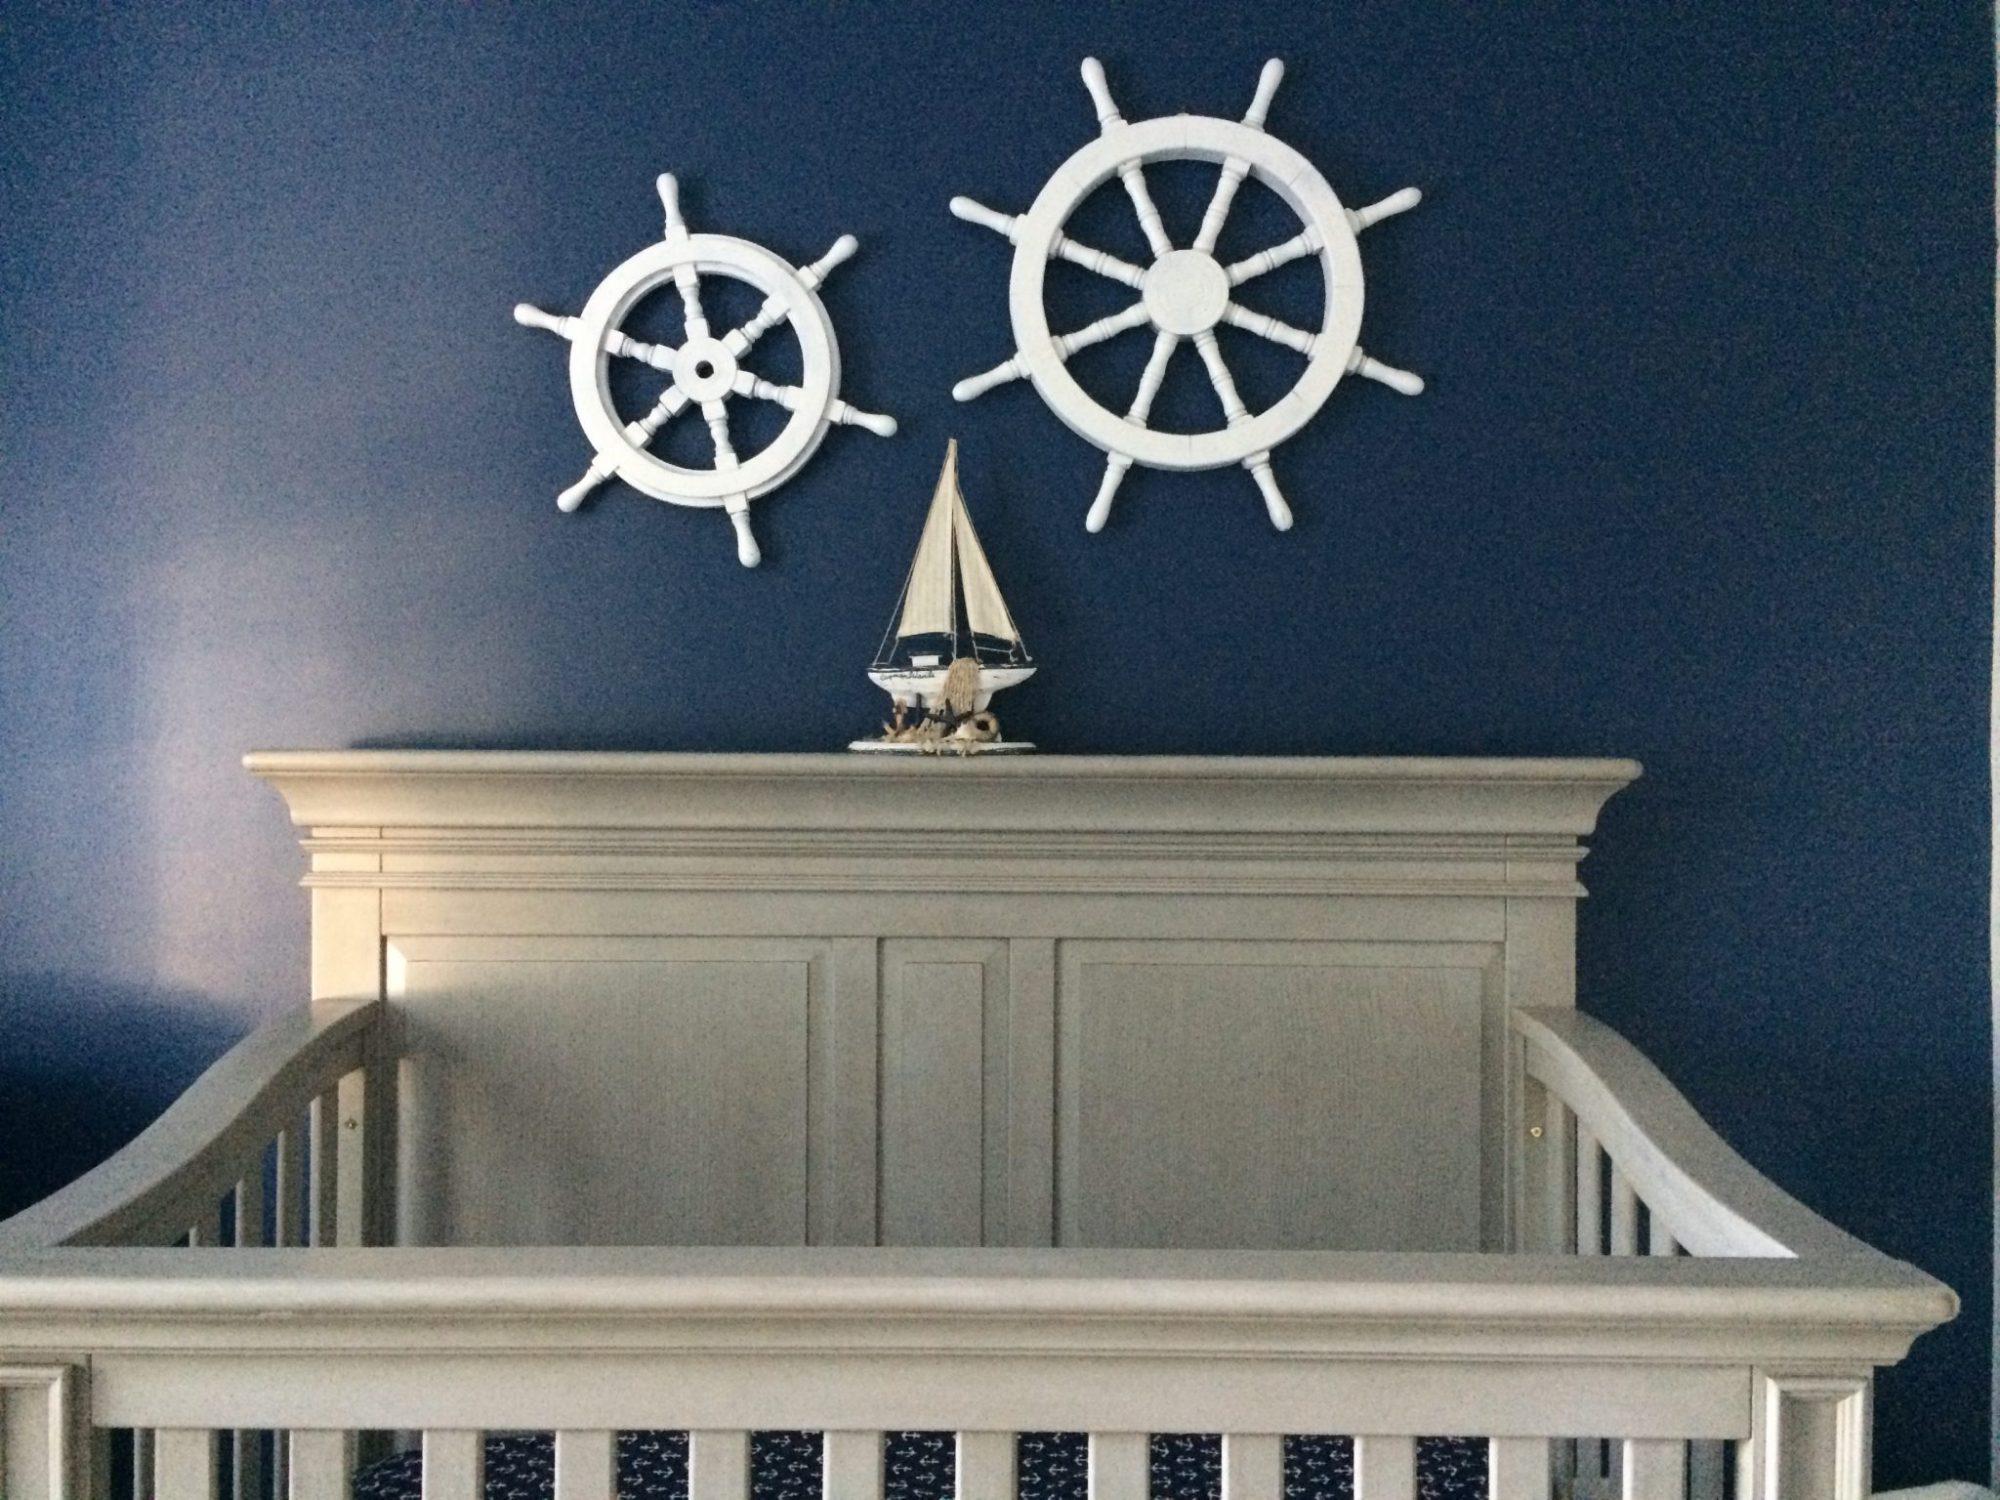 diy nursery decorations nautical wall art. Black Bedroom Furniture Sets. Home Design Ideas